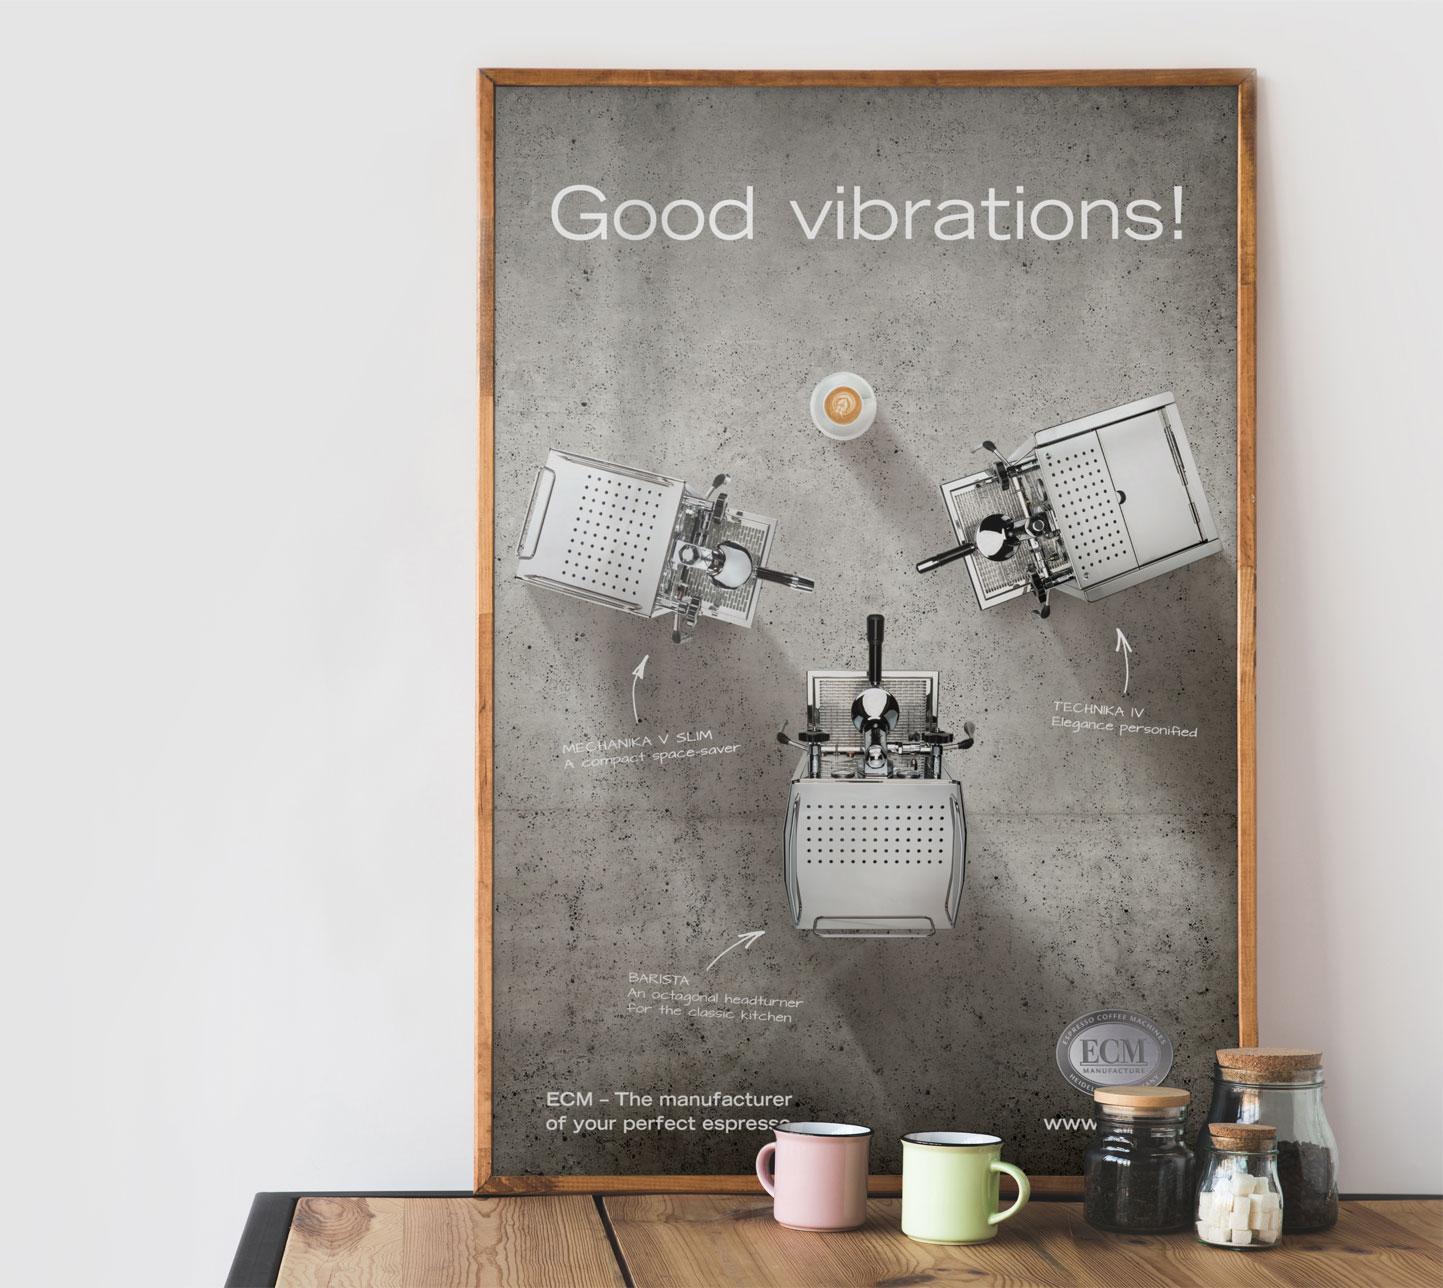 P12 Werbeagentur Heidelberg Referenz ECM Produktposter Good Vibrations